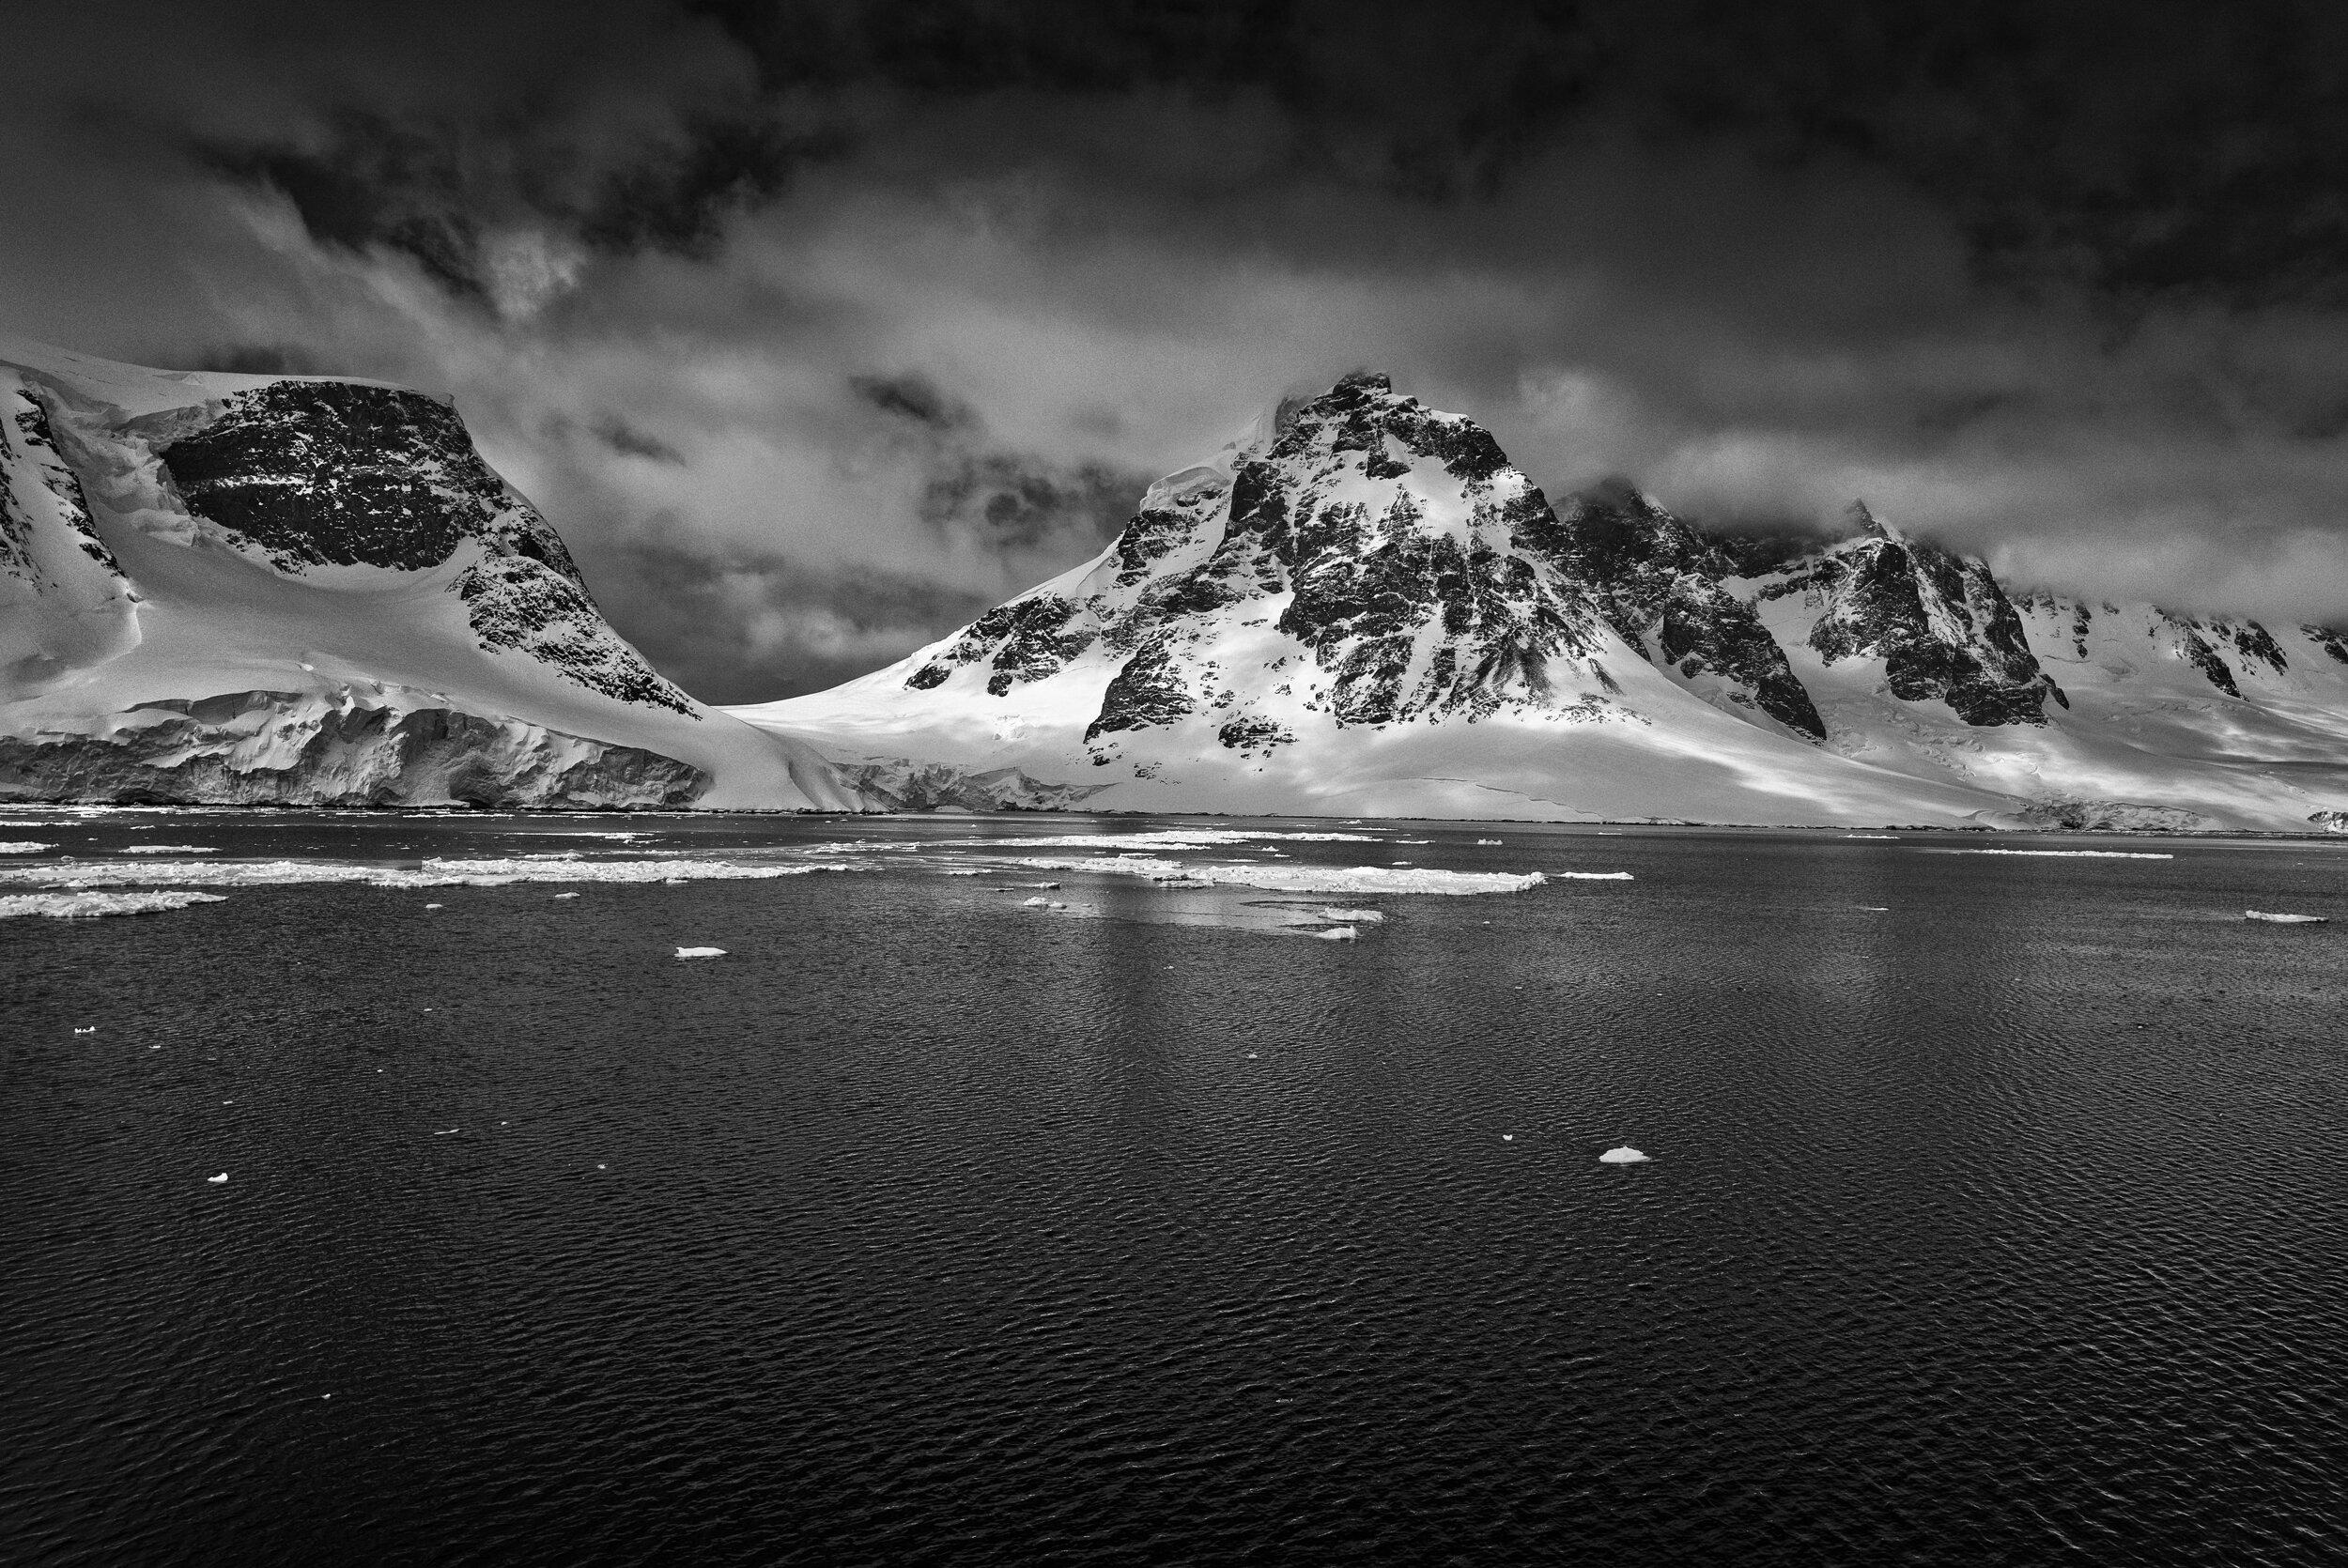 manuel_uebler_antarctica_bw_014.jpg